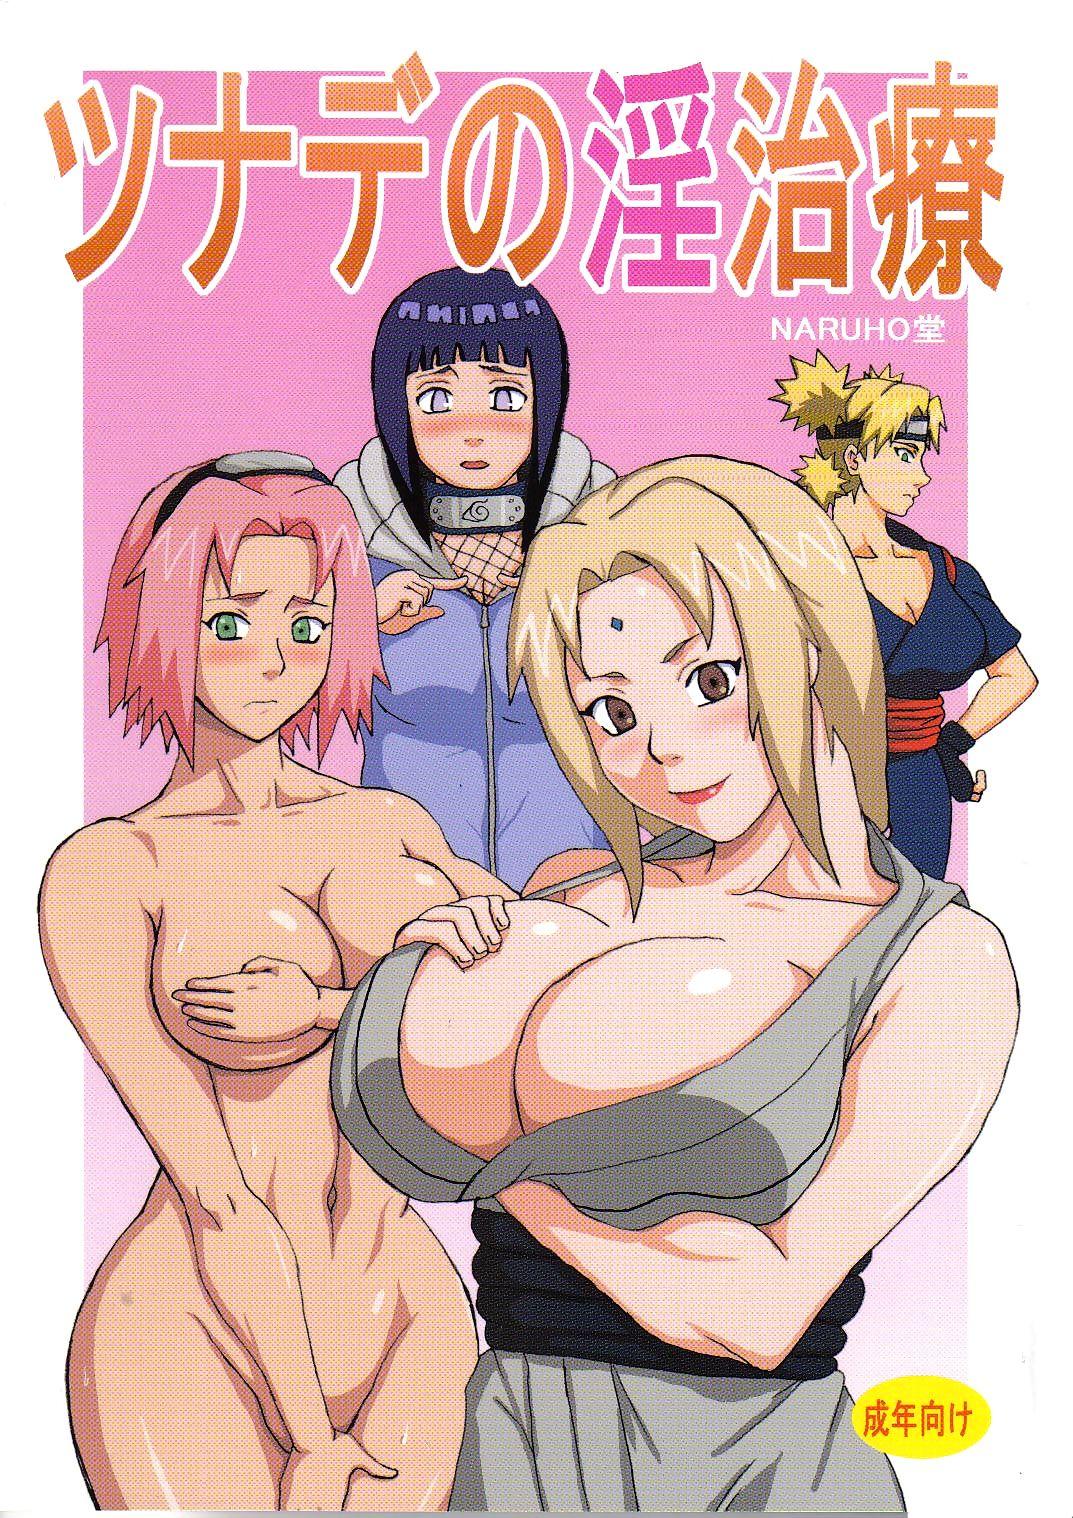 Naruto-Tsunade's Lecherous Marinate